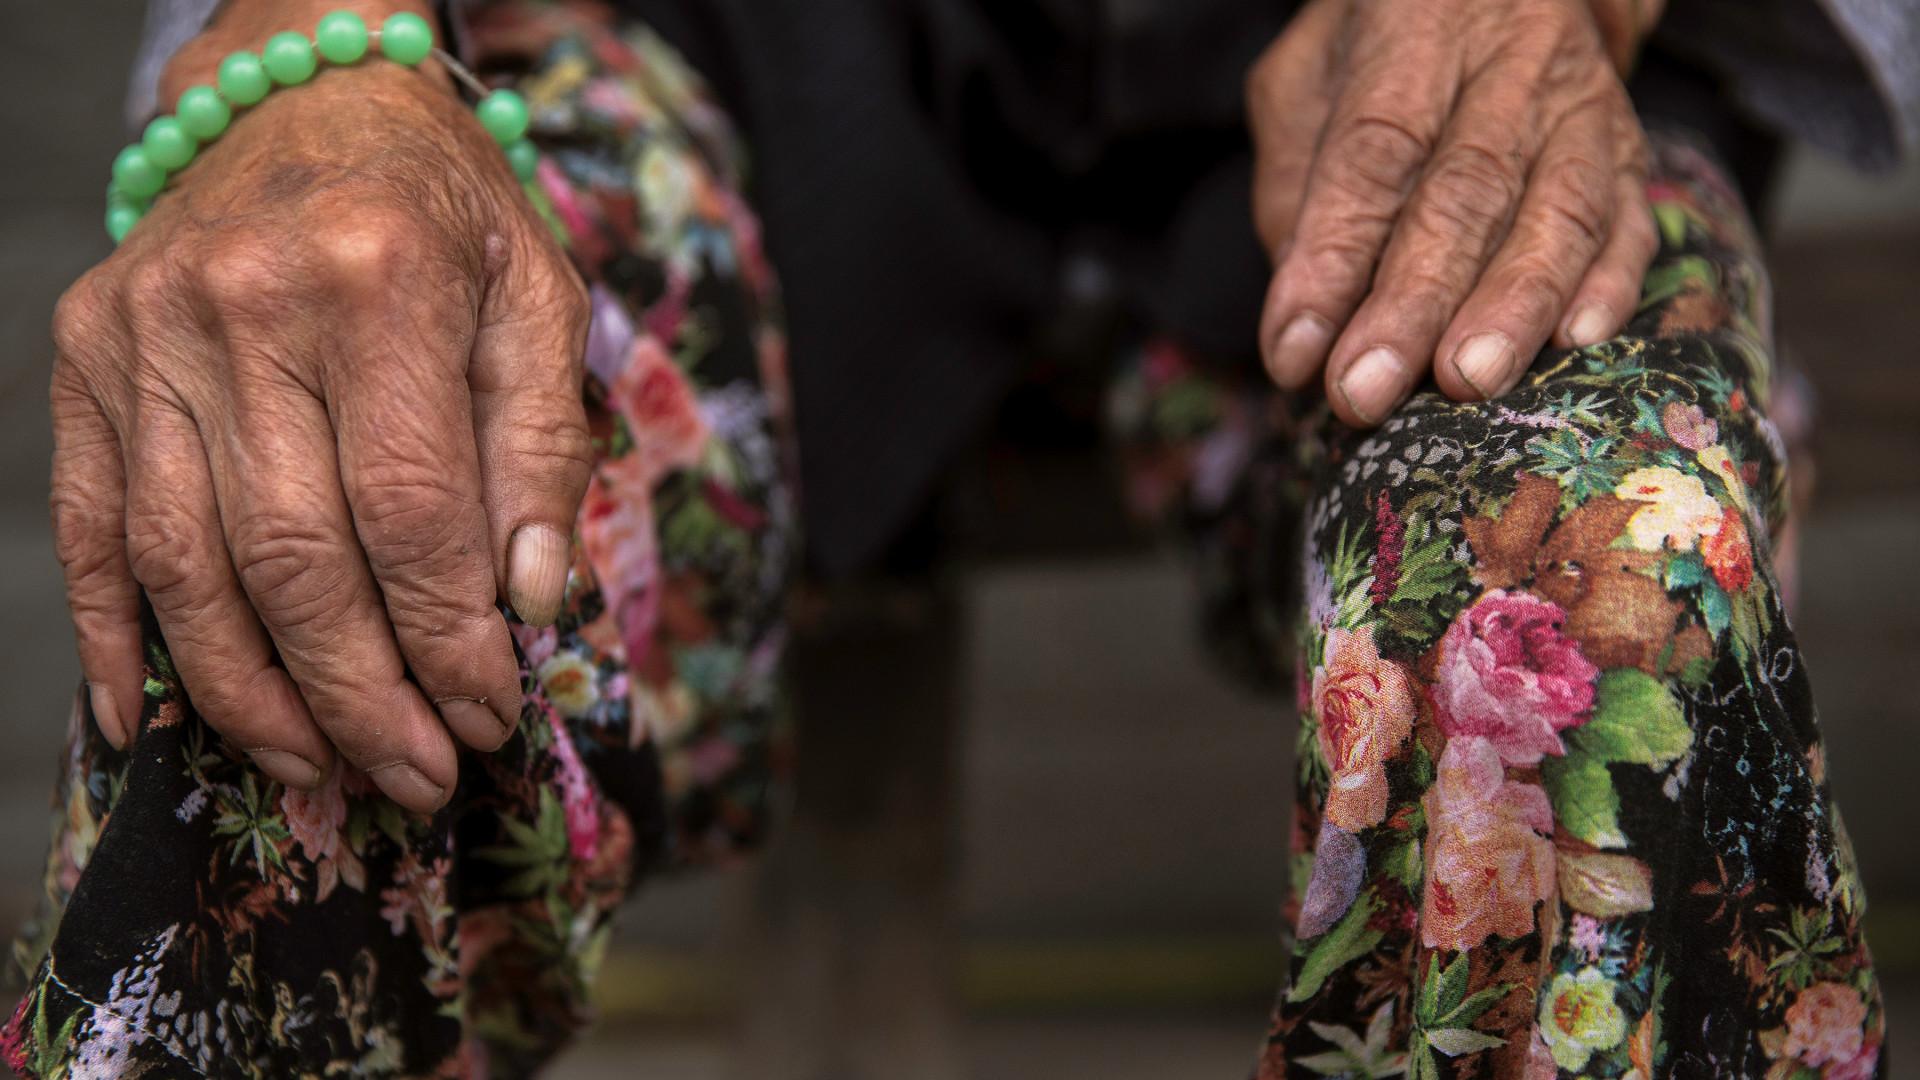 Quase 300 mil portugueses têm mais de 84 anos. Sabe onde vivem?